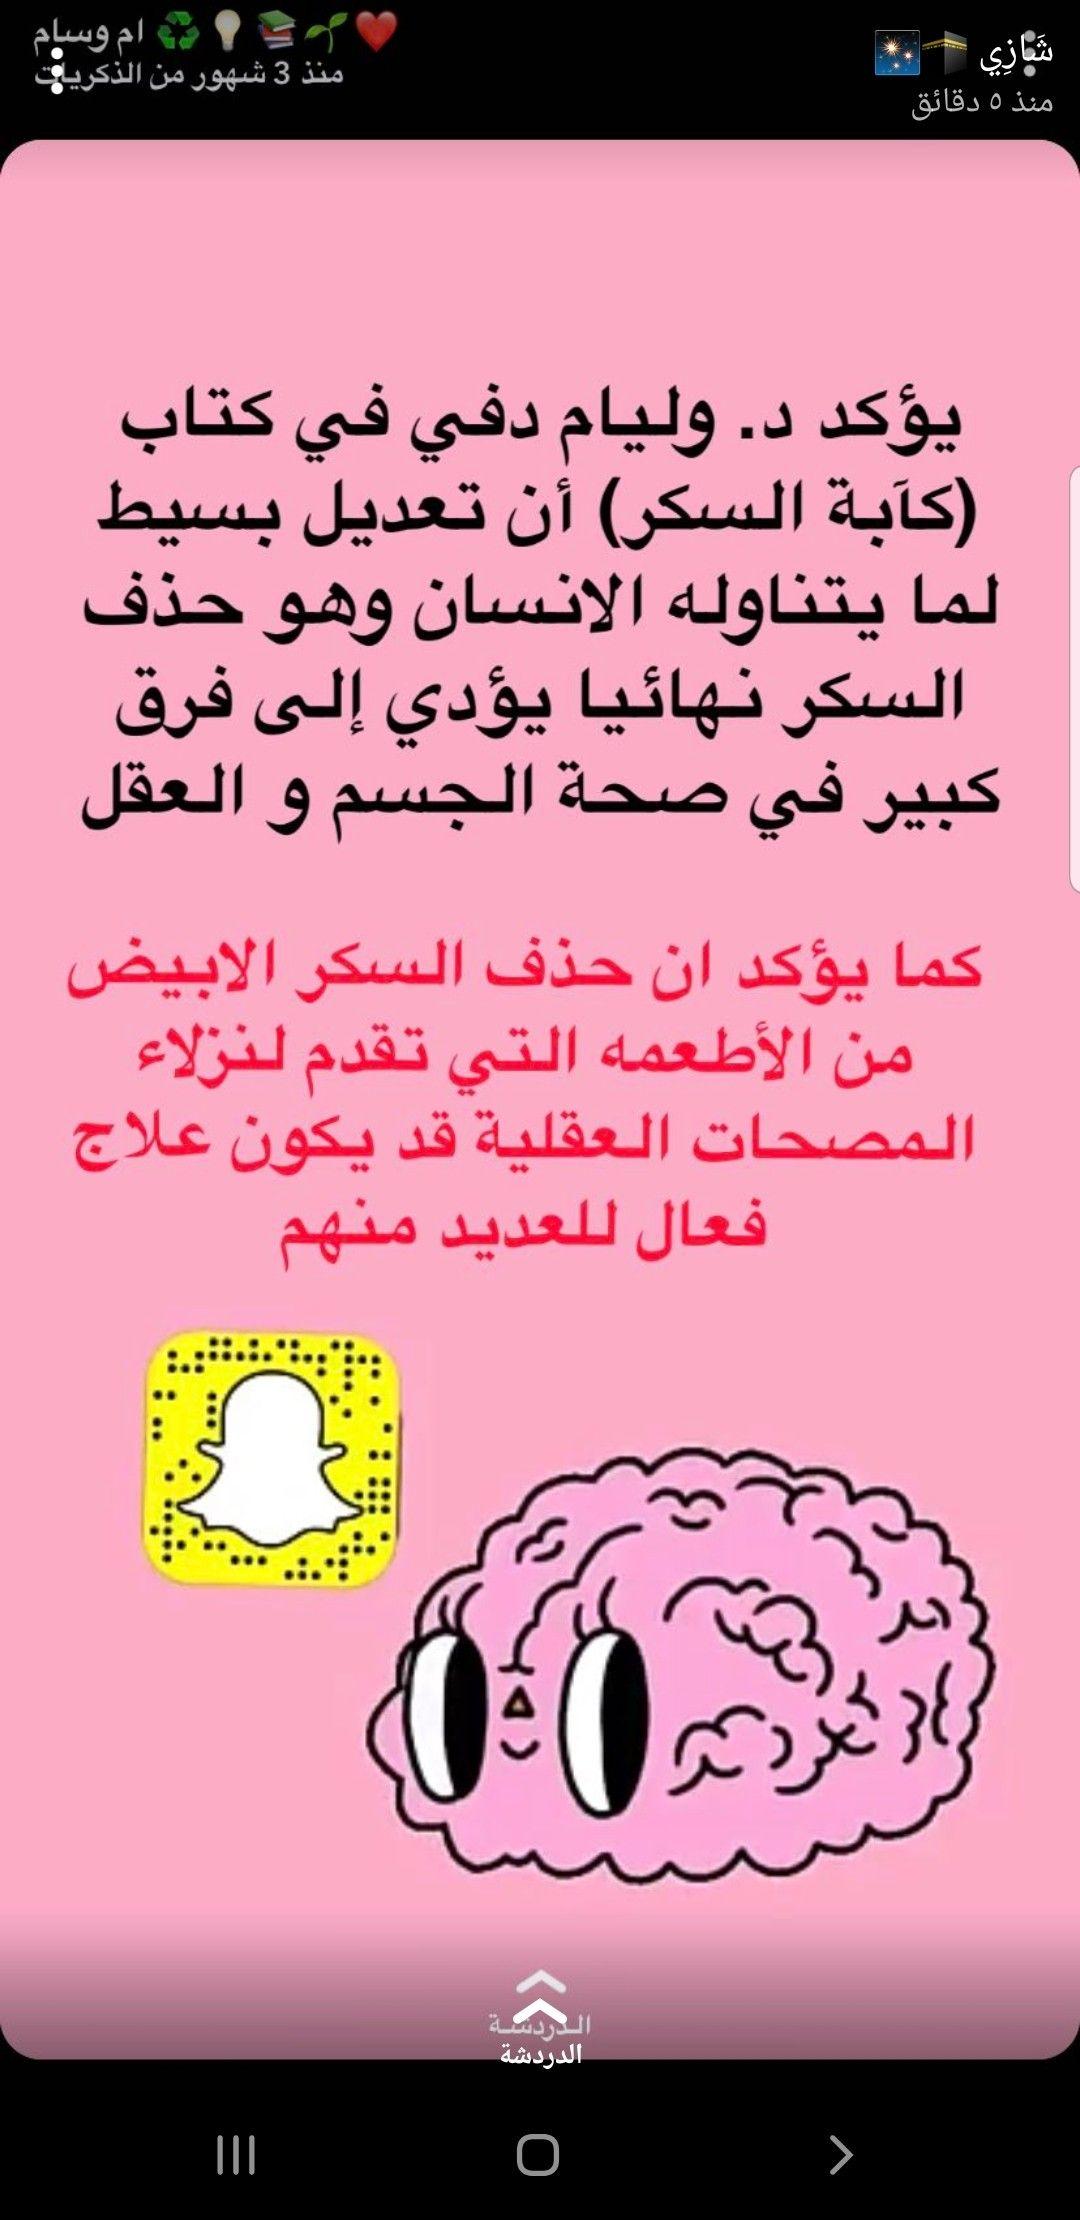 Pin By Aman On تغذية علاجية المعدة بيت الداء و الدواء توعية Fictional Characters Character Snoopy